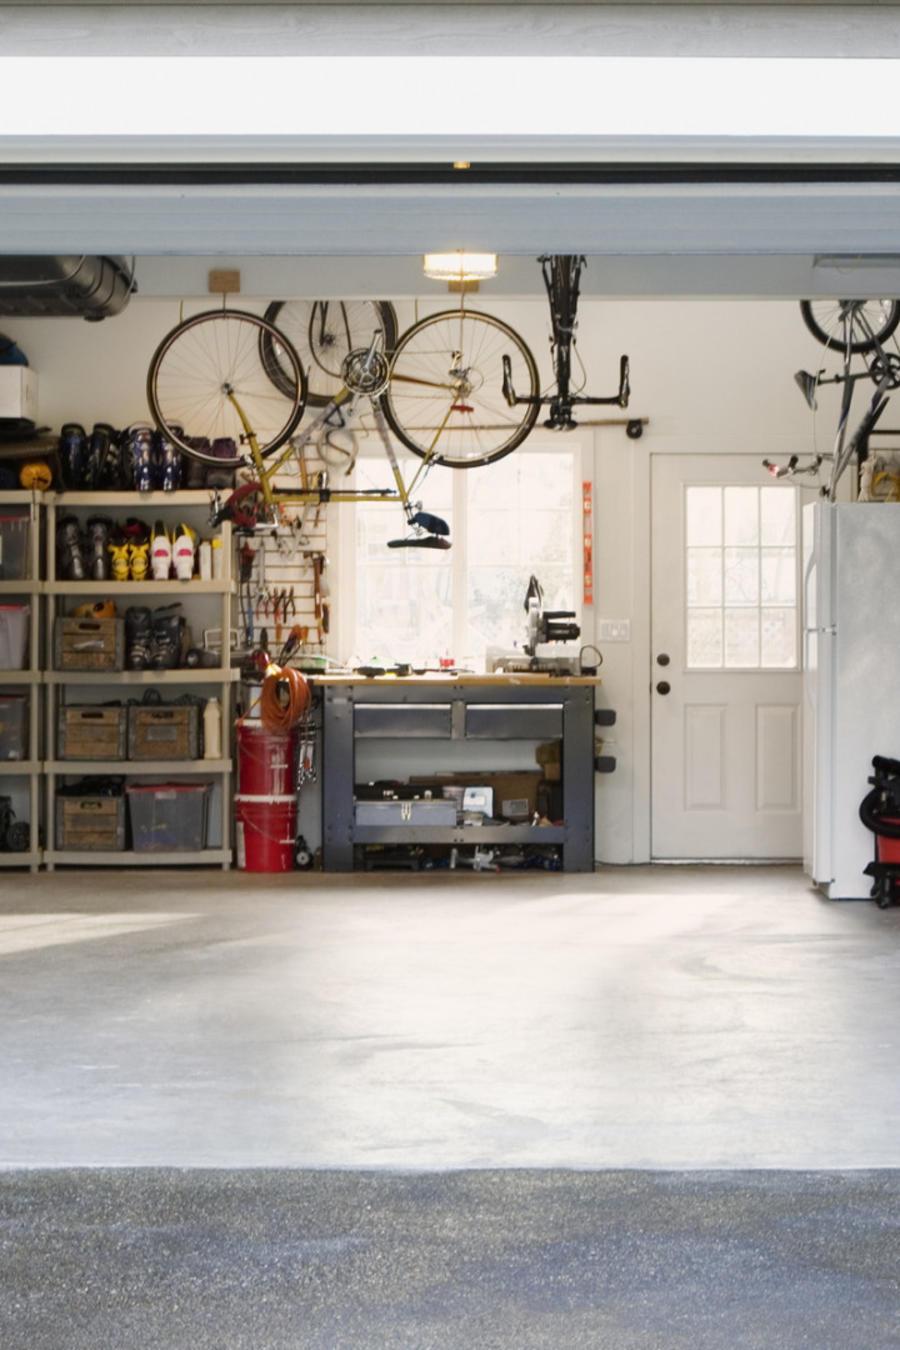 Garage organizado